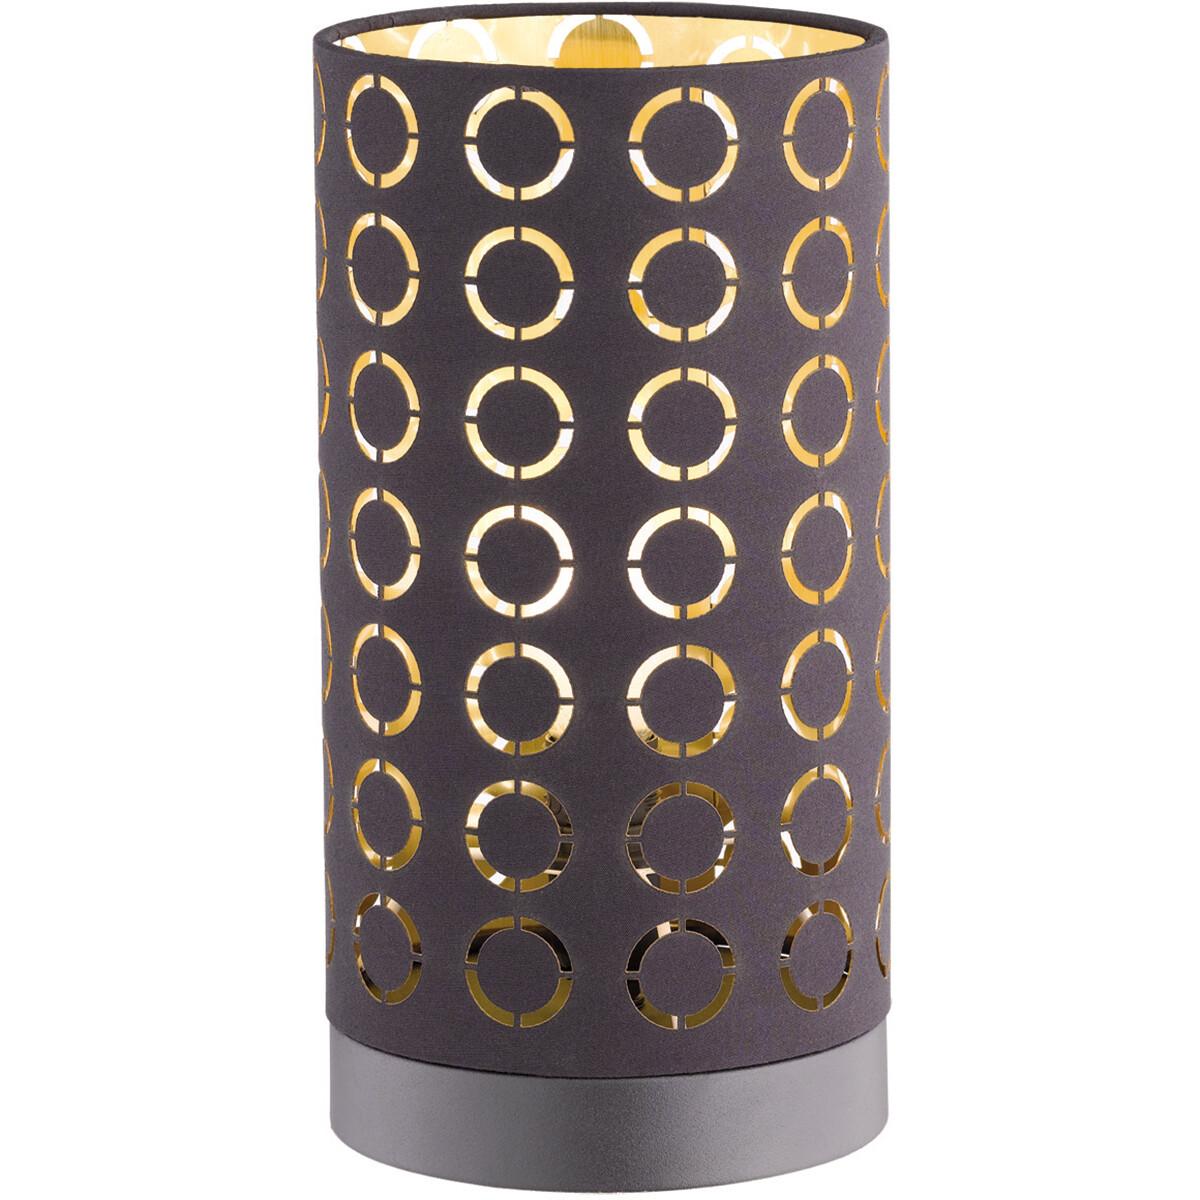 LED Tafellamp - Tafelverlichting - Trion Twiton - E14 Fitting - Rond - Mat Zwart - Aluminium